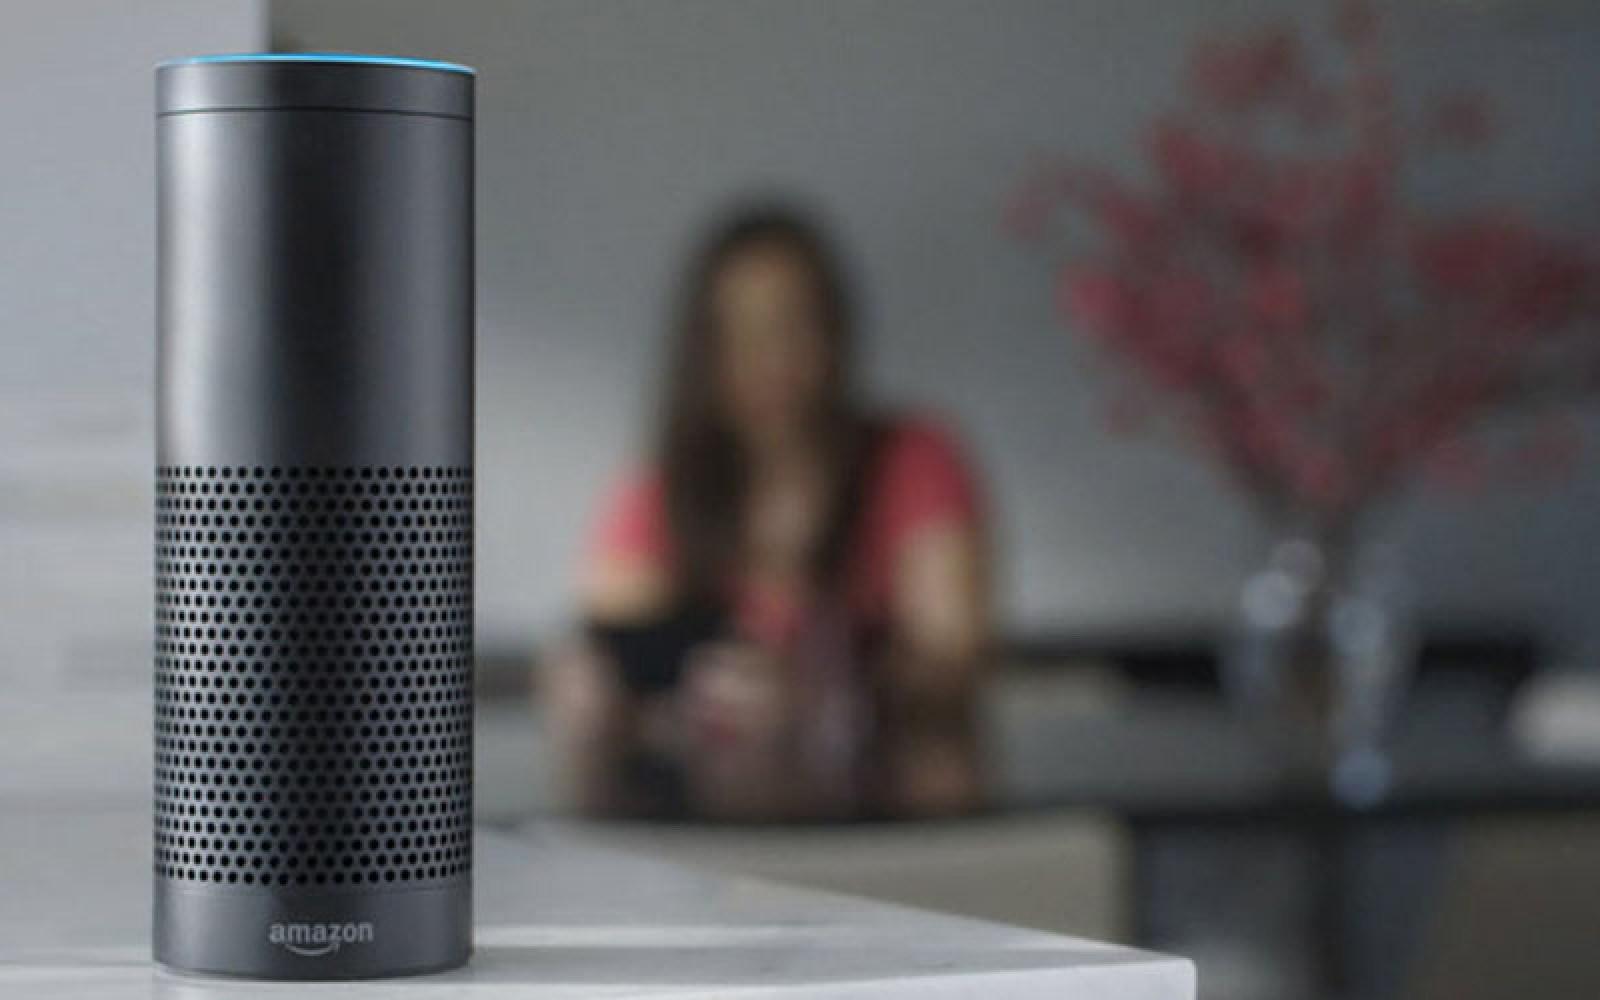 Apple's rumored Siri-powered Amazon Echo competitor now in prototype testing – Bloomberg